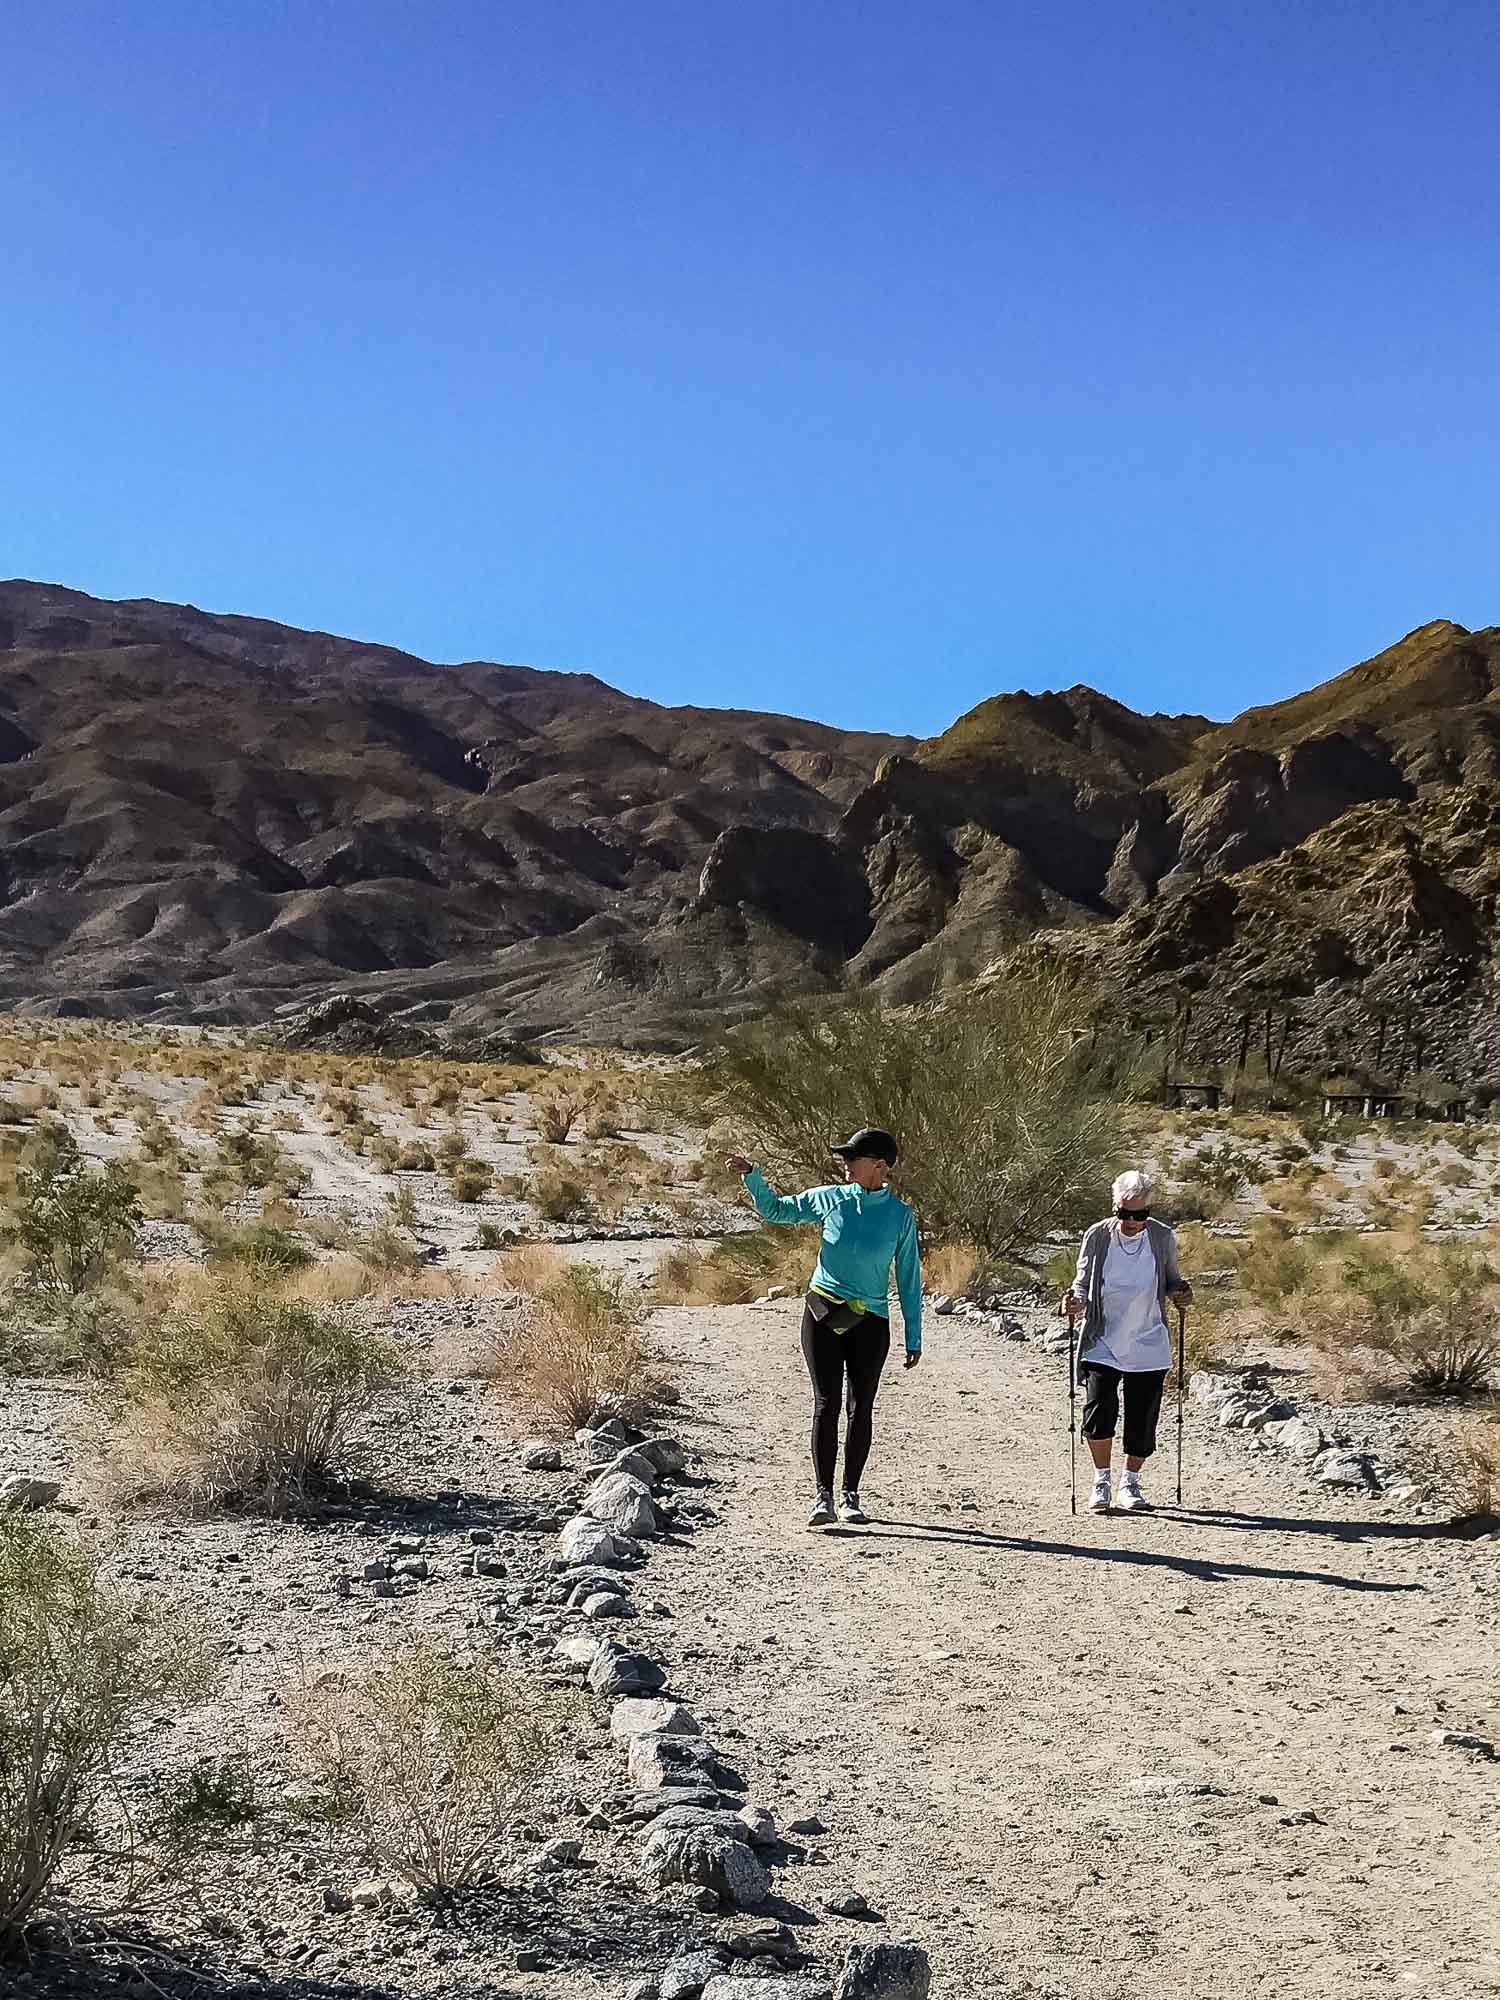 Hiking the Cove